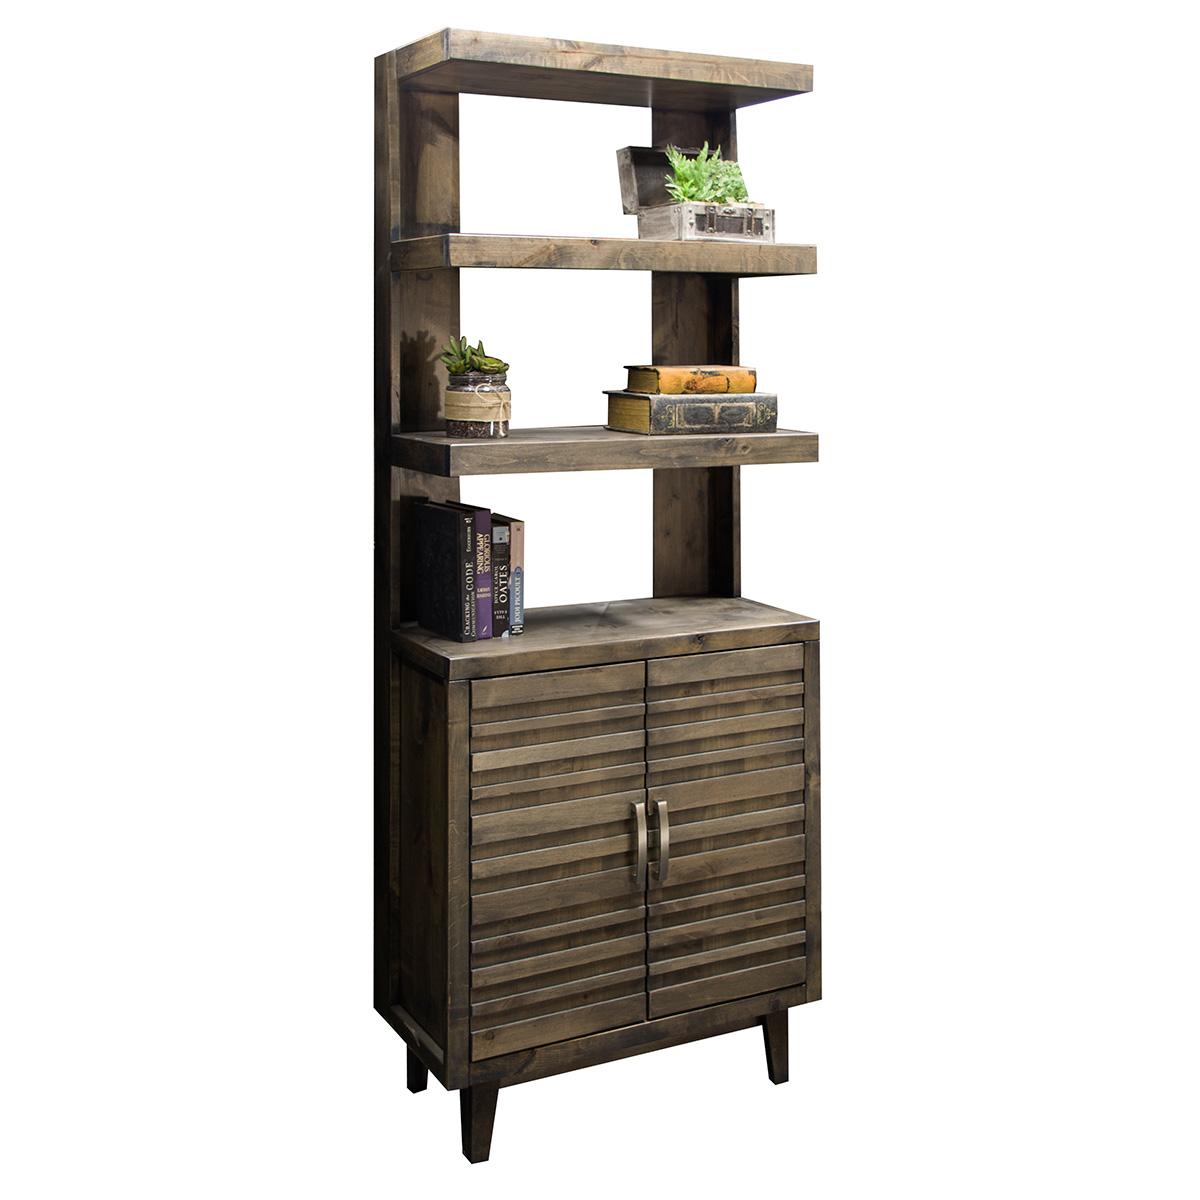 hayneedle bookcase legends sausalito master furniture product cfm standard cupboard